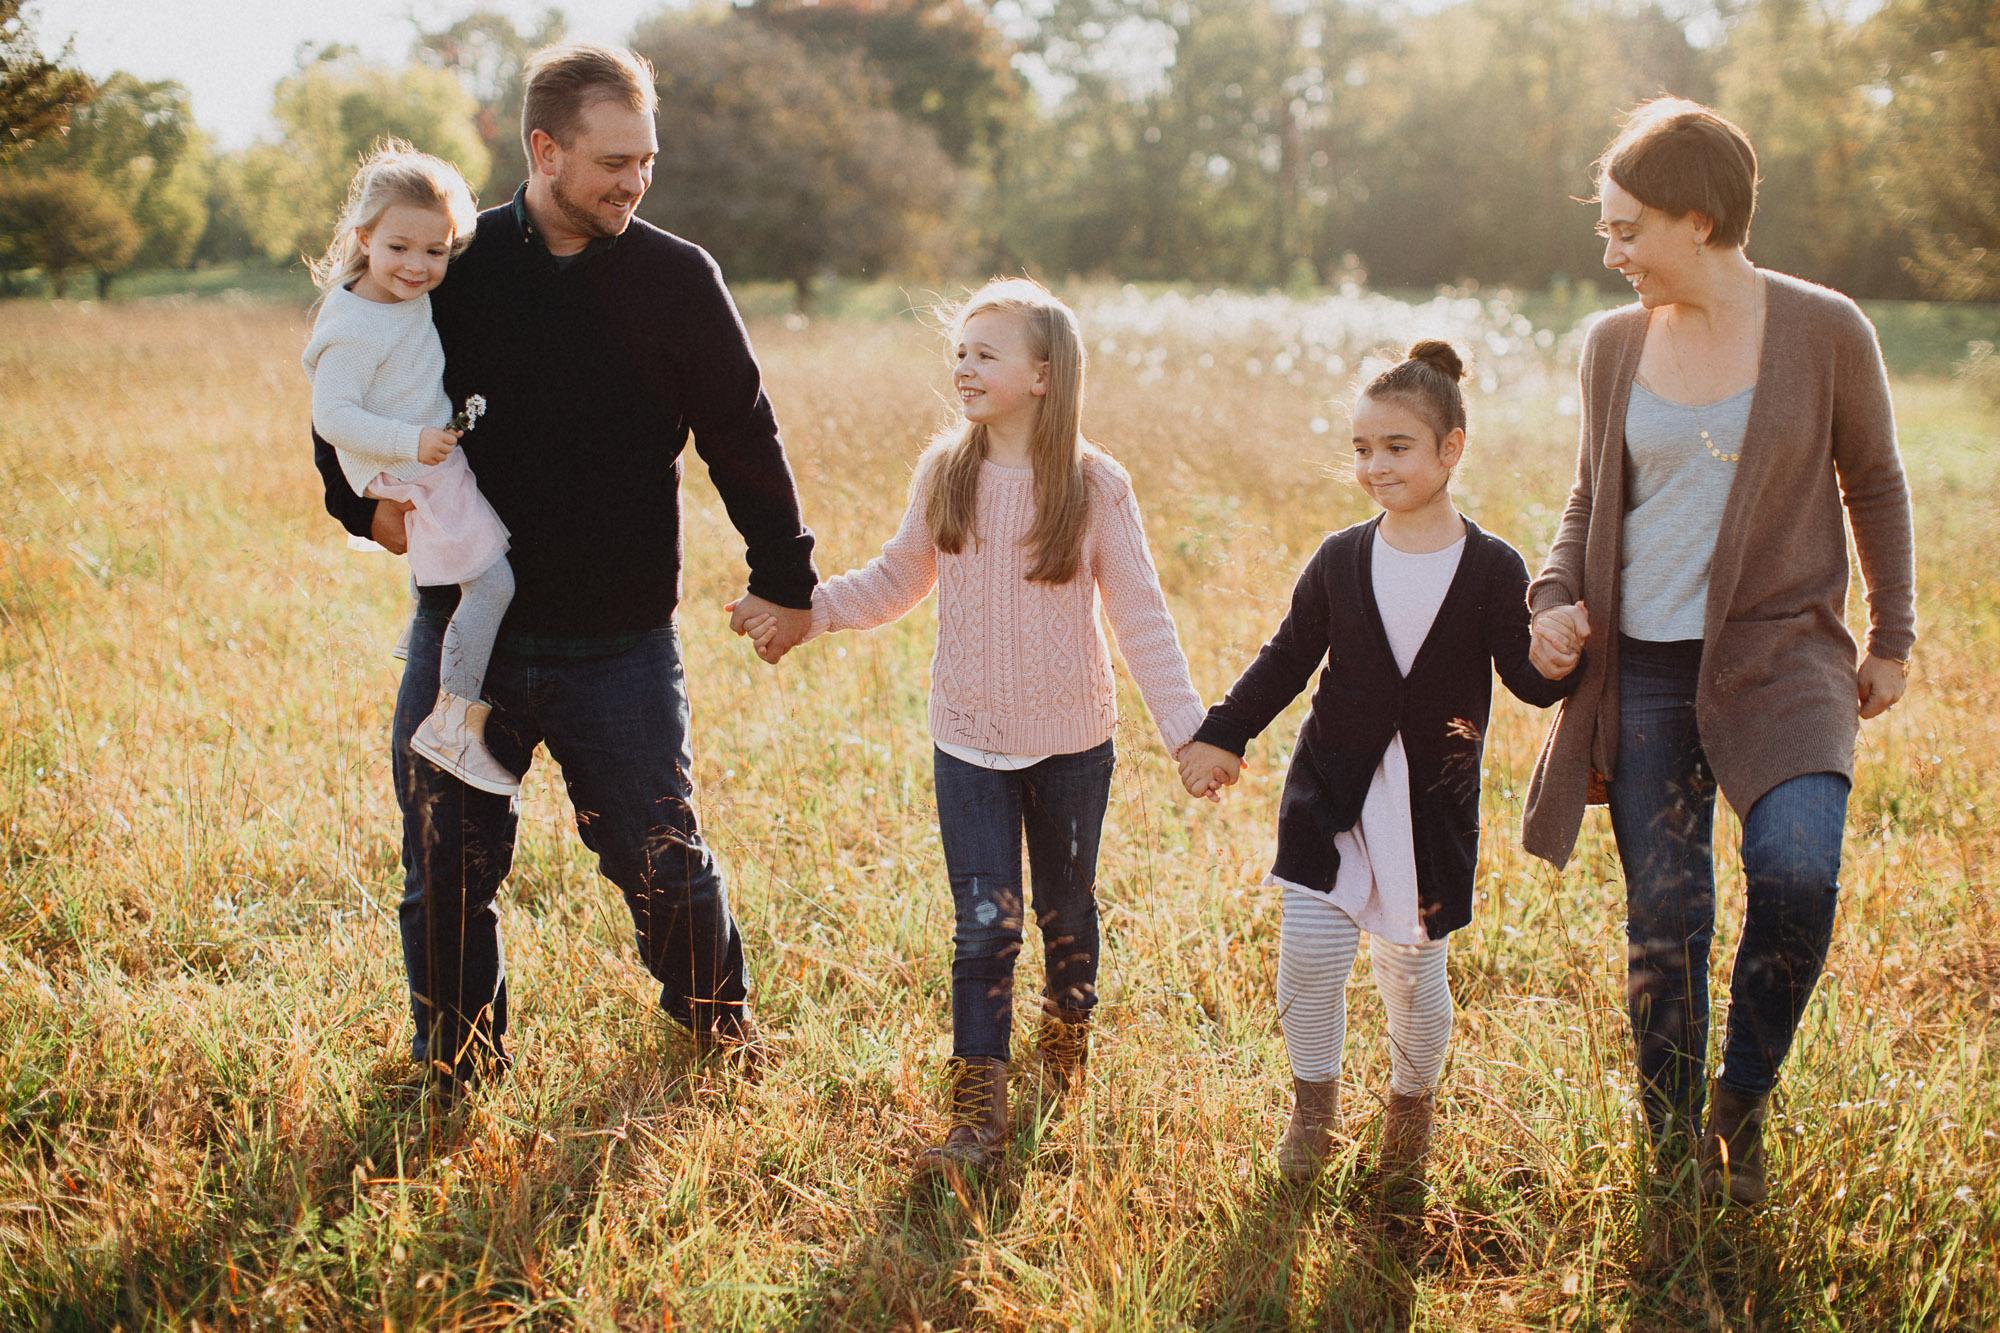 The Brauns - Dayton Family Photos - 09.jpg